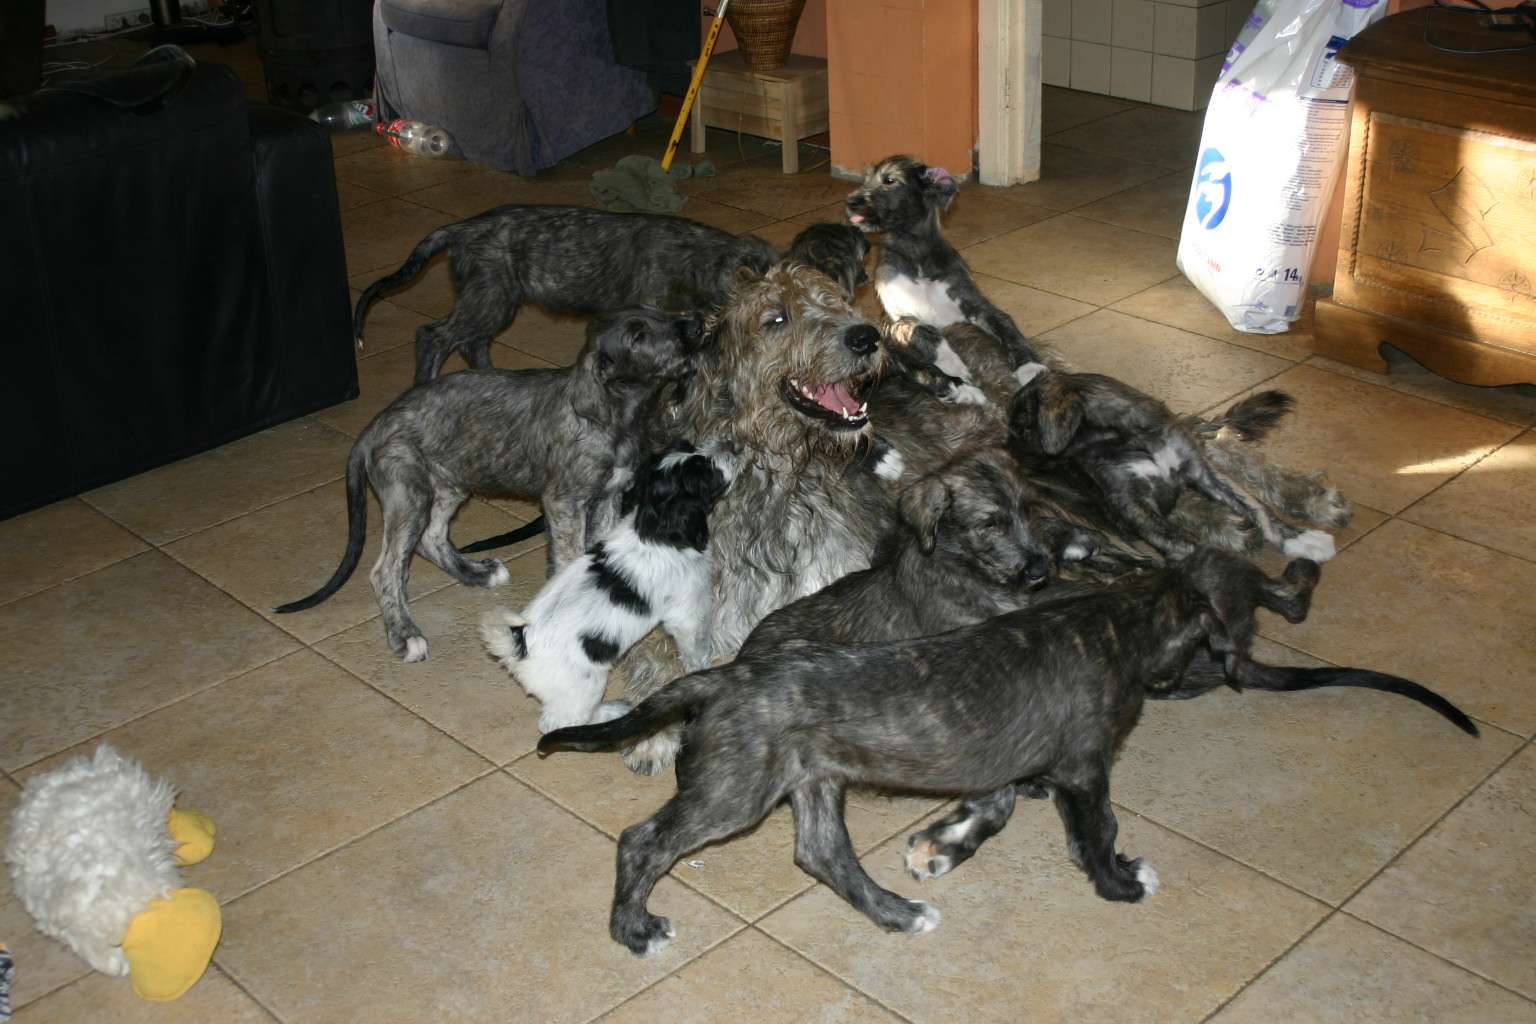 9 new puppies born!